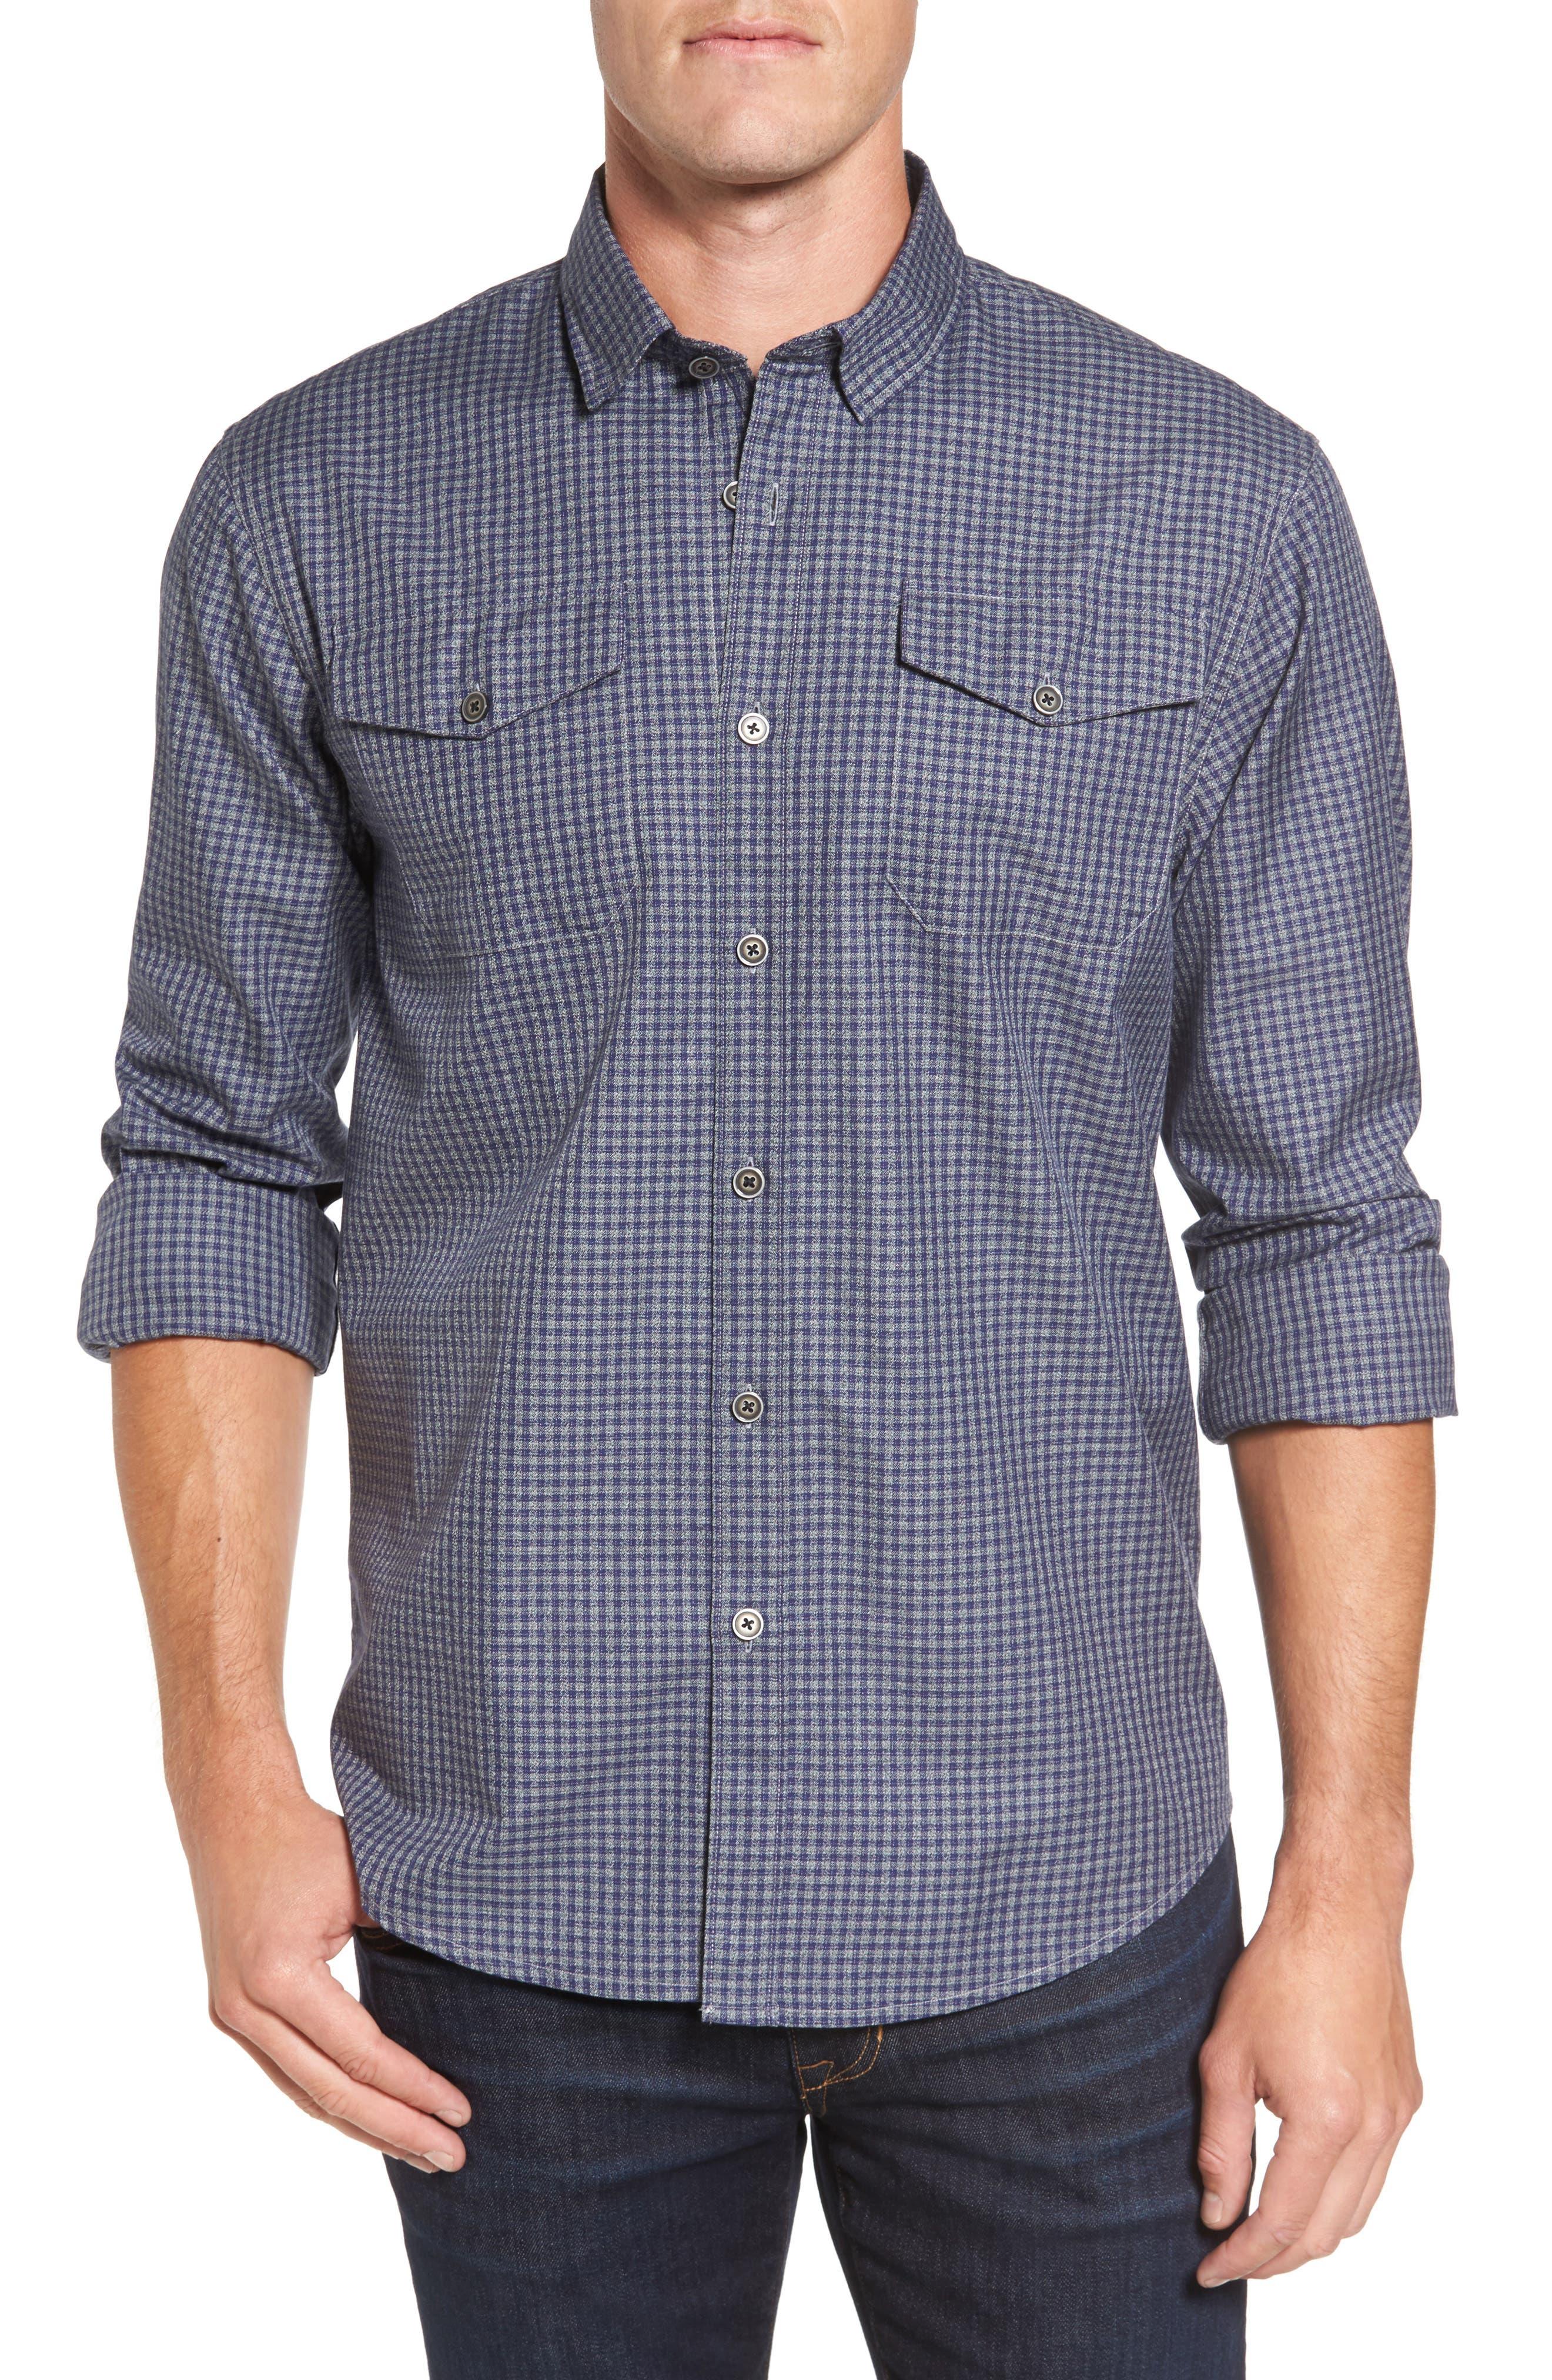 Alternate Image 1 Selected - Coastaoro Main Street Check Flannel Shirt